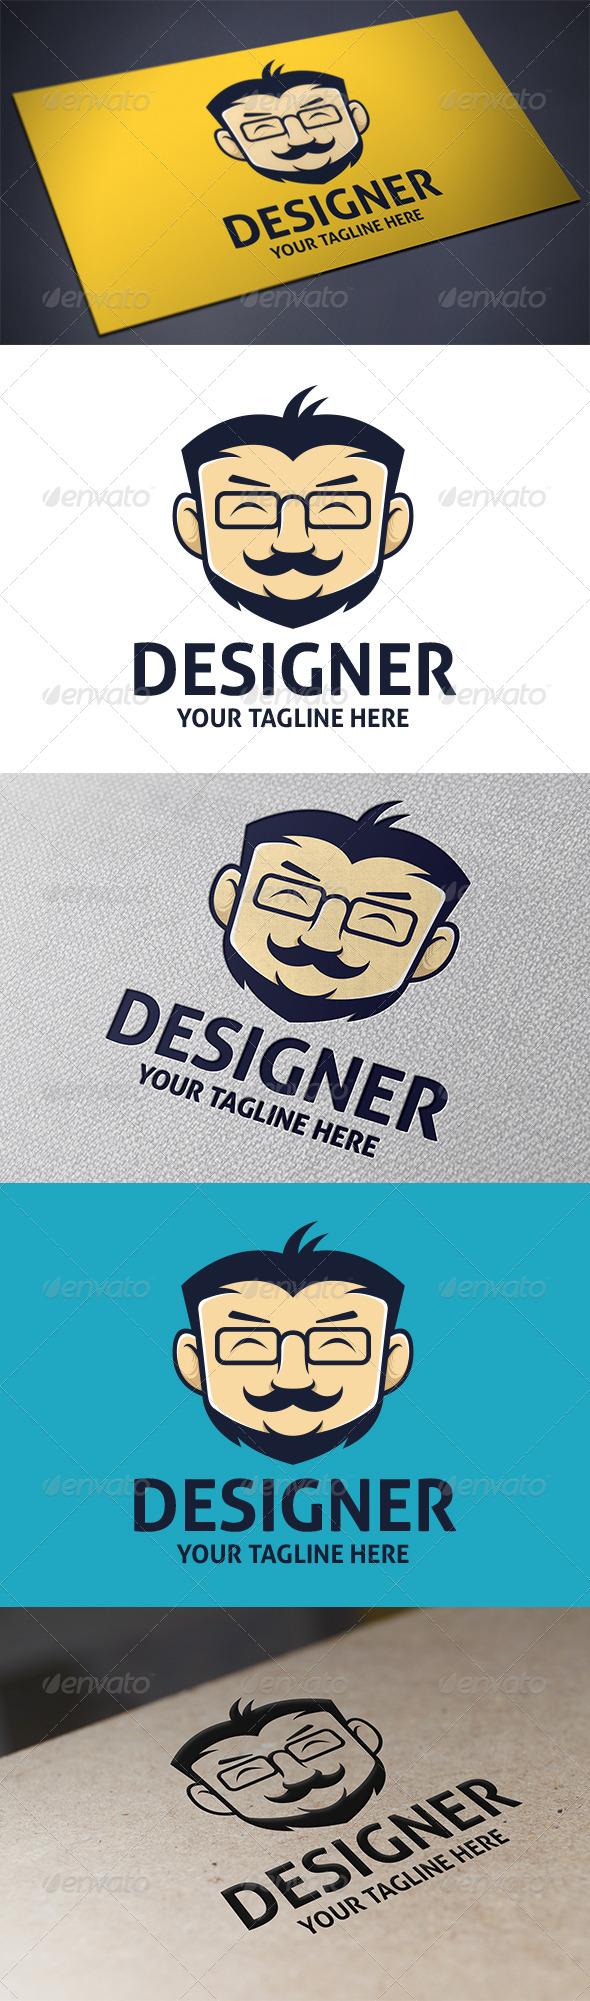 GraphicRiver Geek Designer Logo 5692291